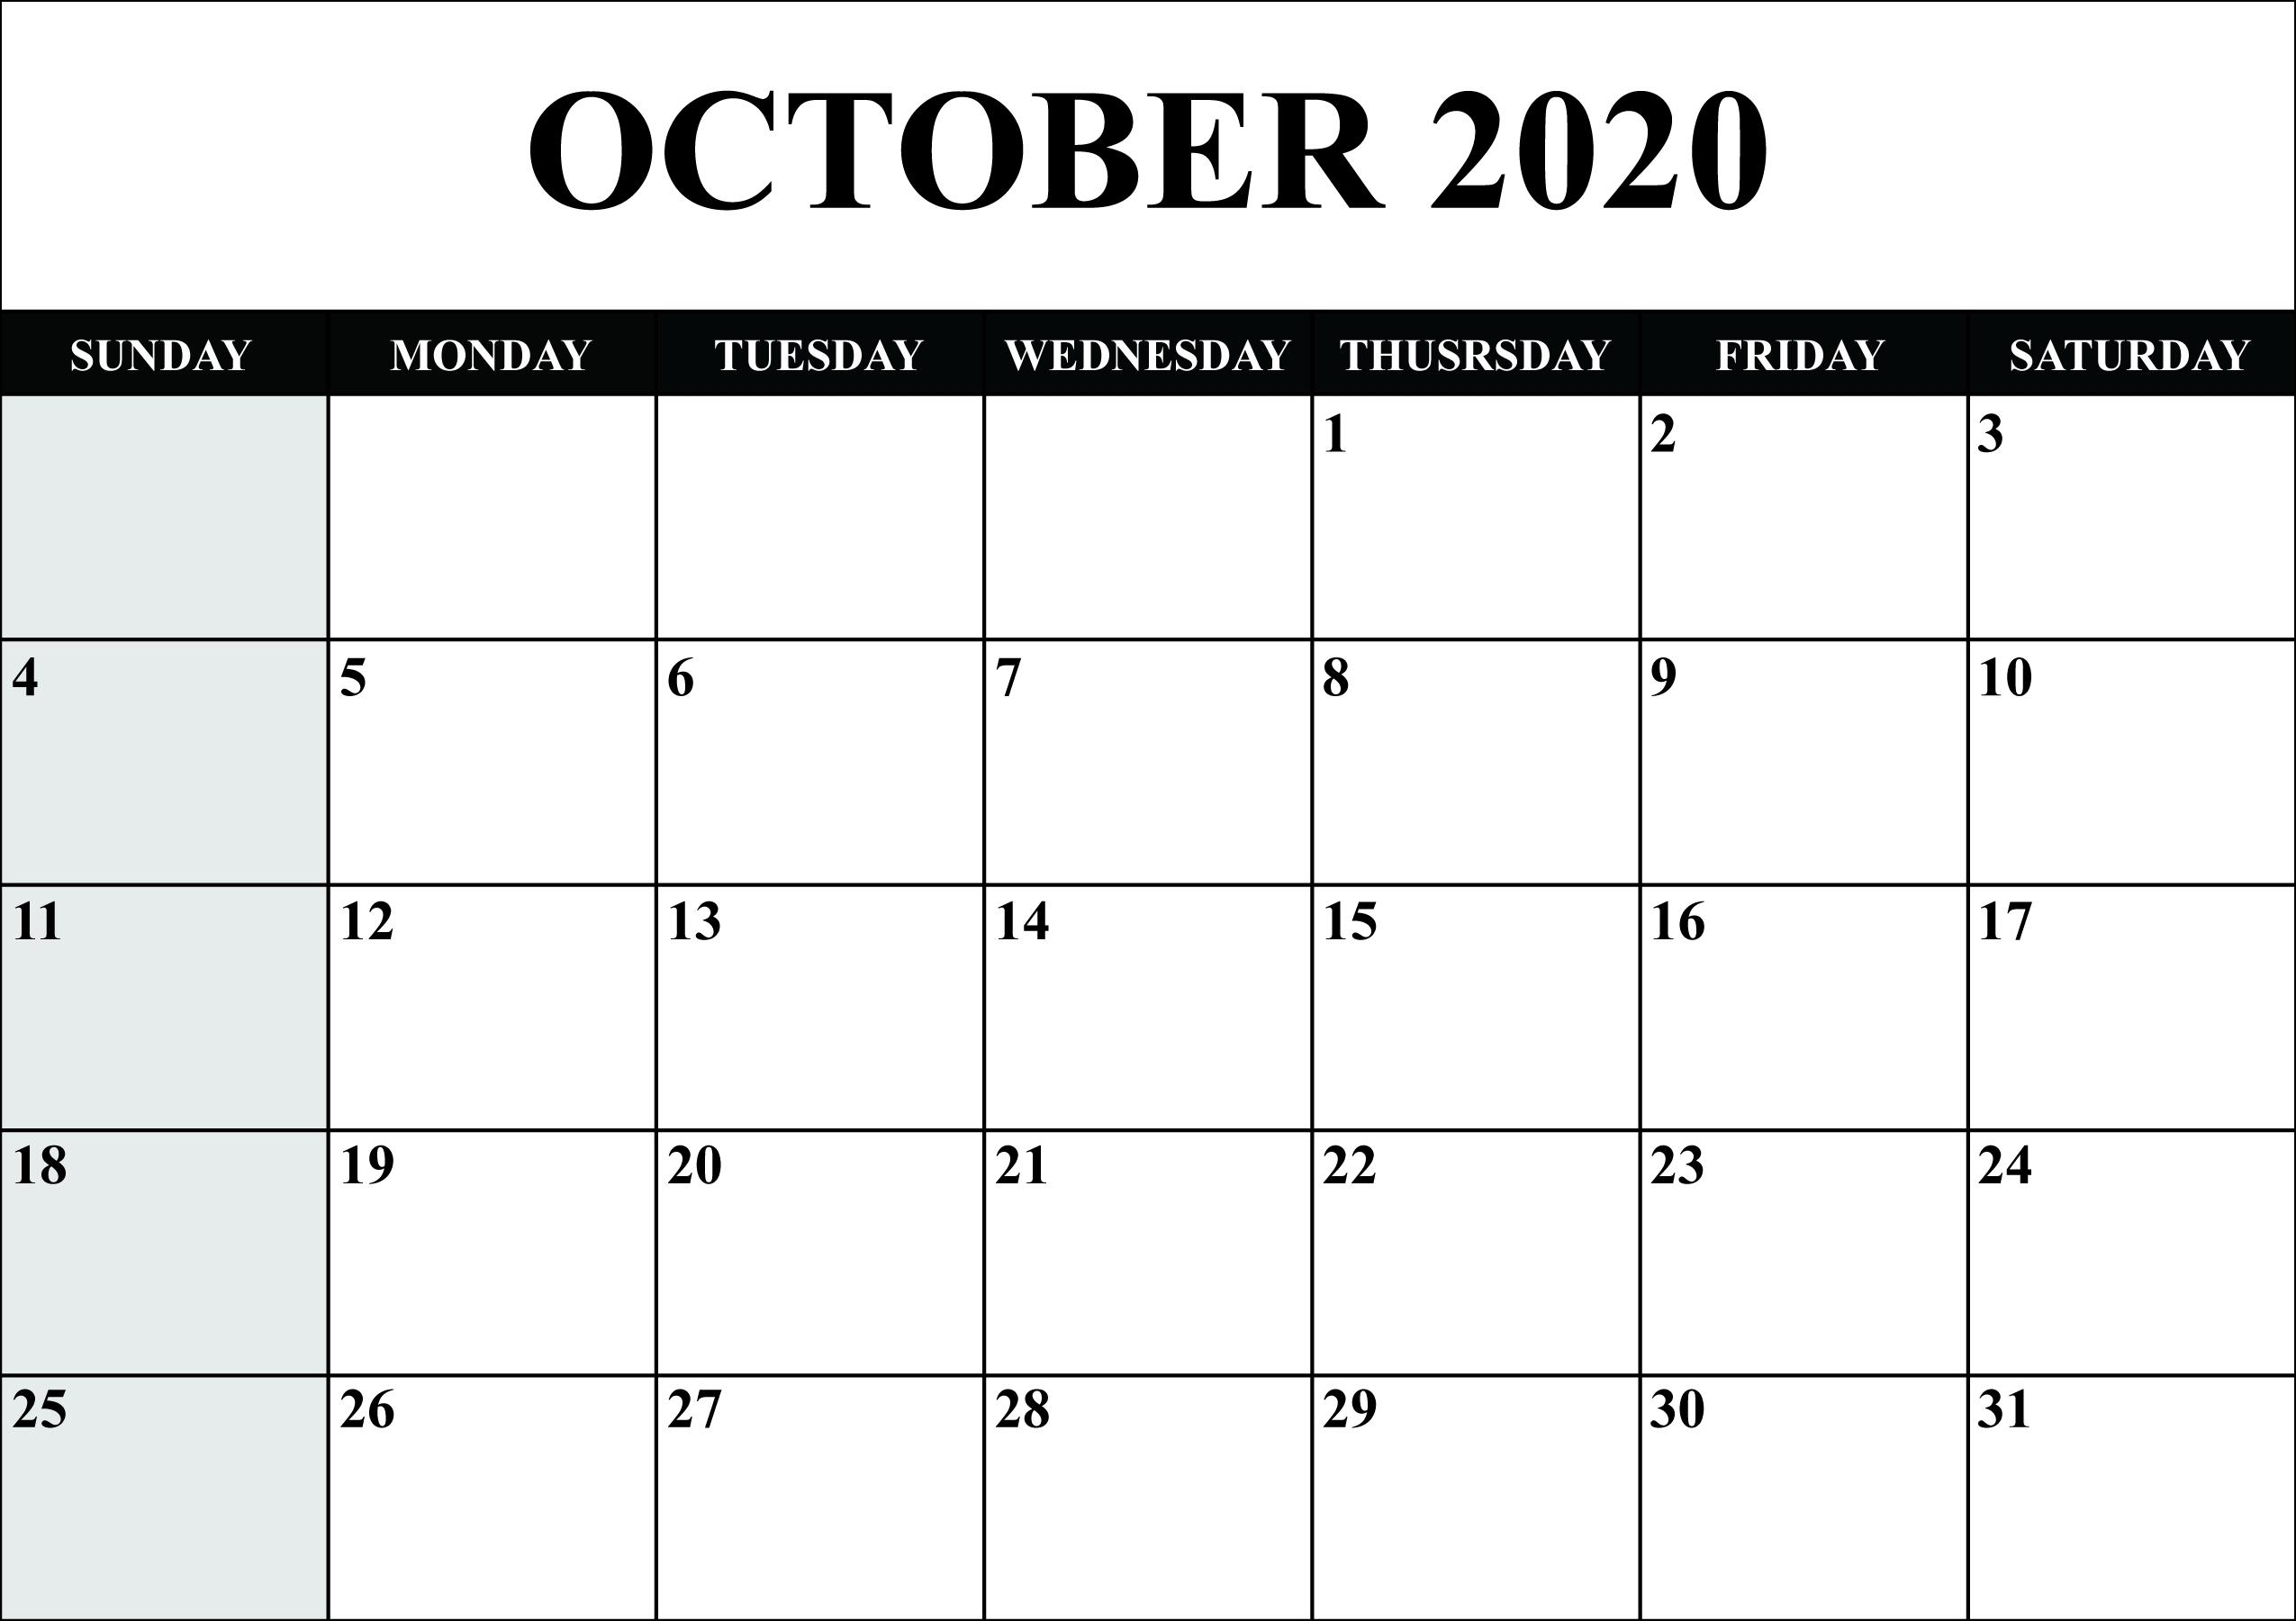 Free Printable October 2020 Calendar Template - Pdf, Word-Blank Printable Calendar 2020 Monthly